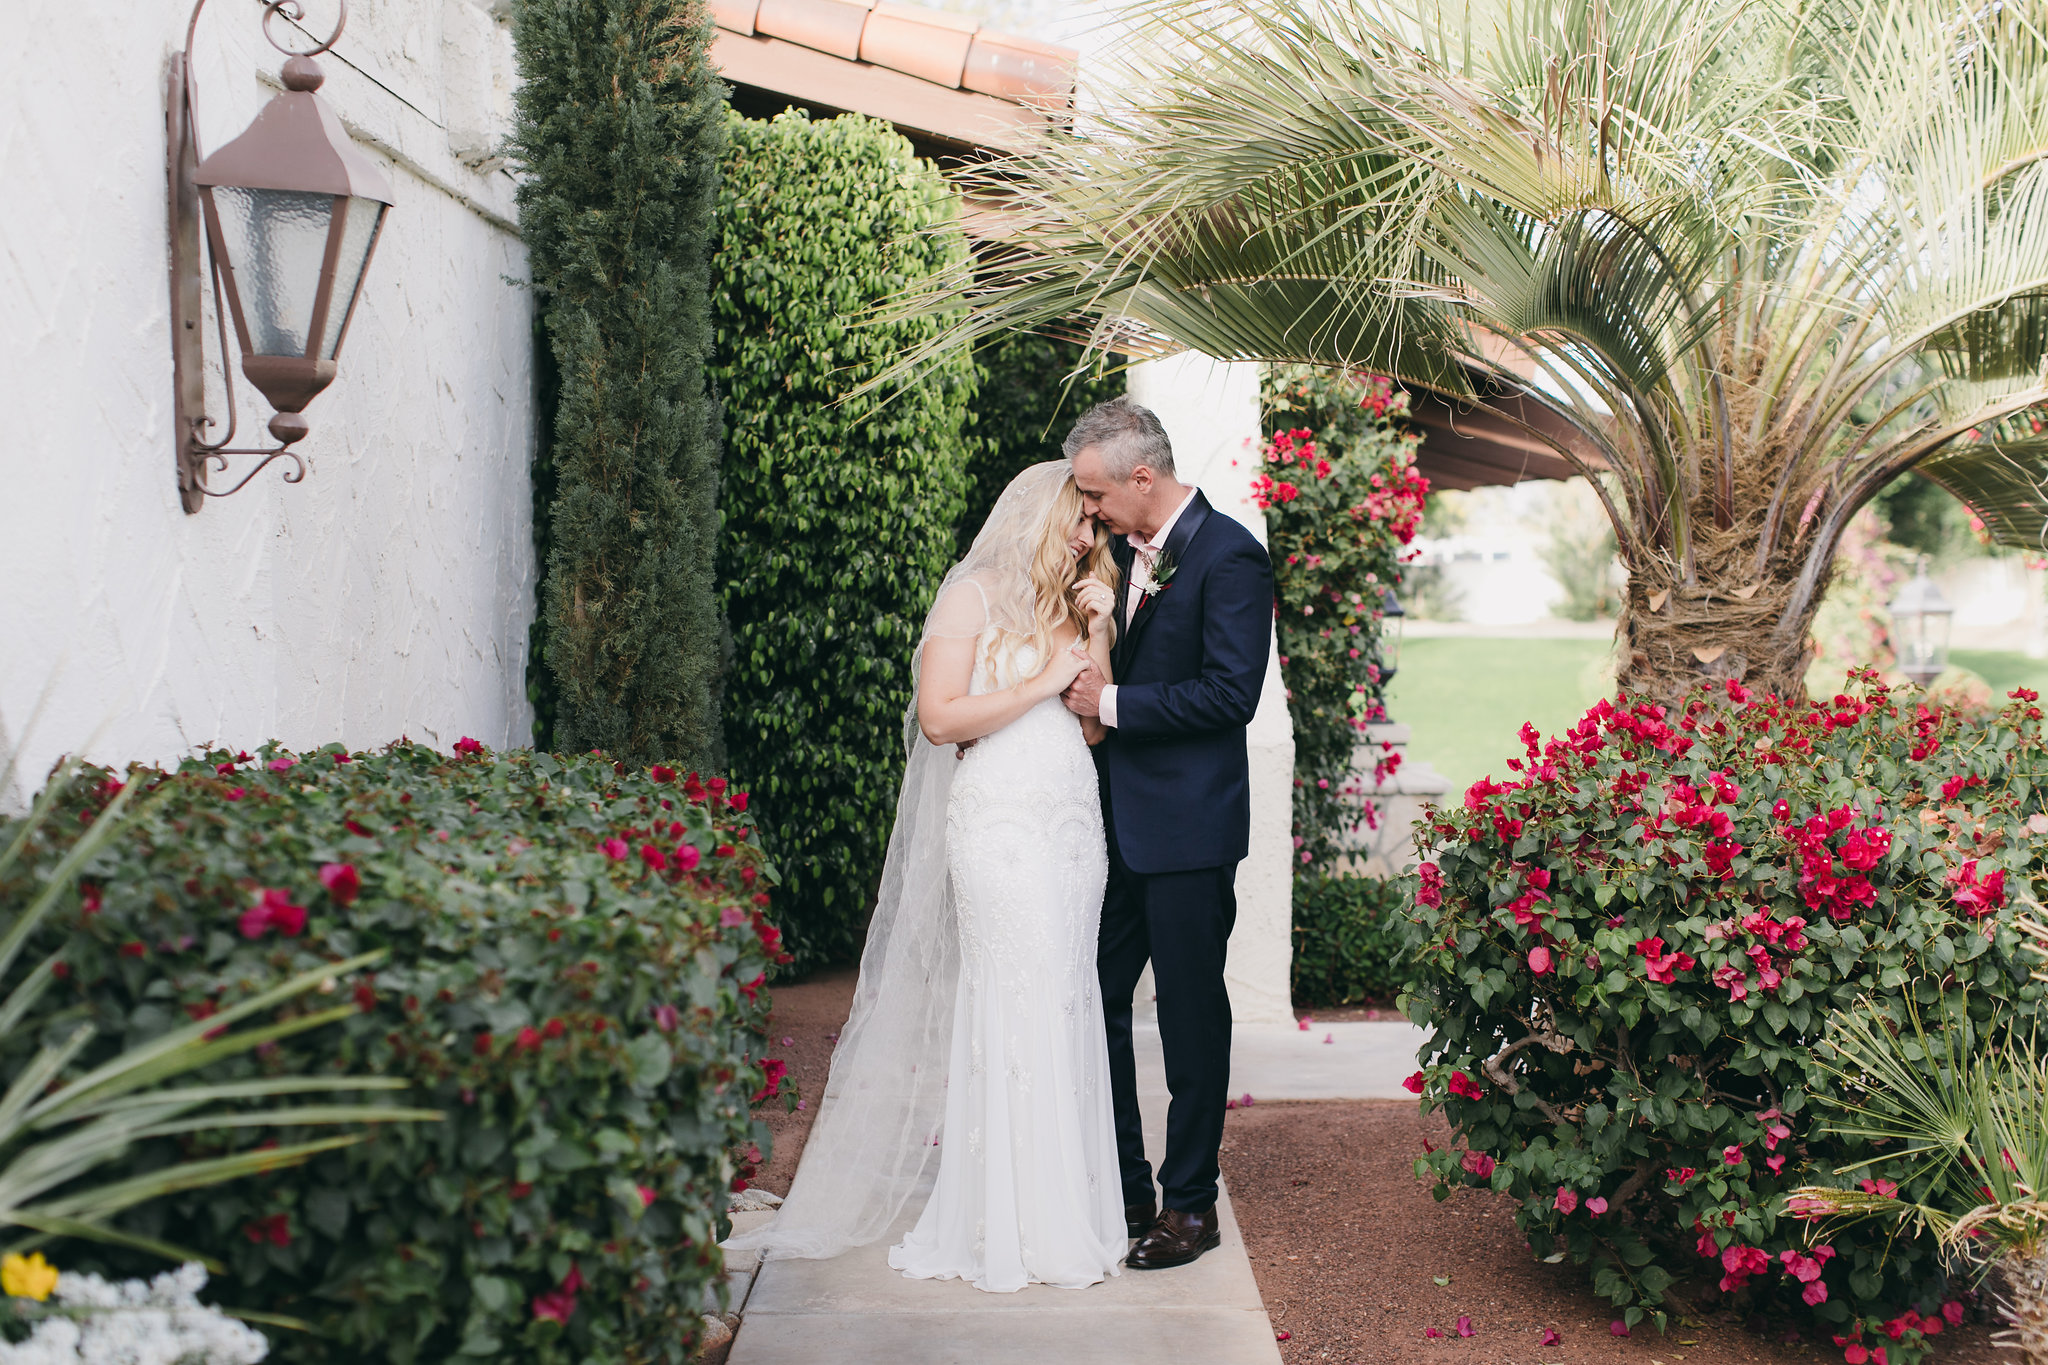 Gracy-Andrew-Wedding-141.jpg